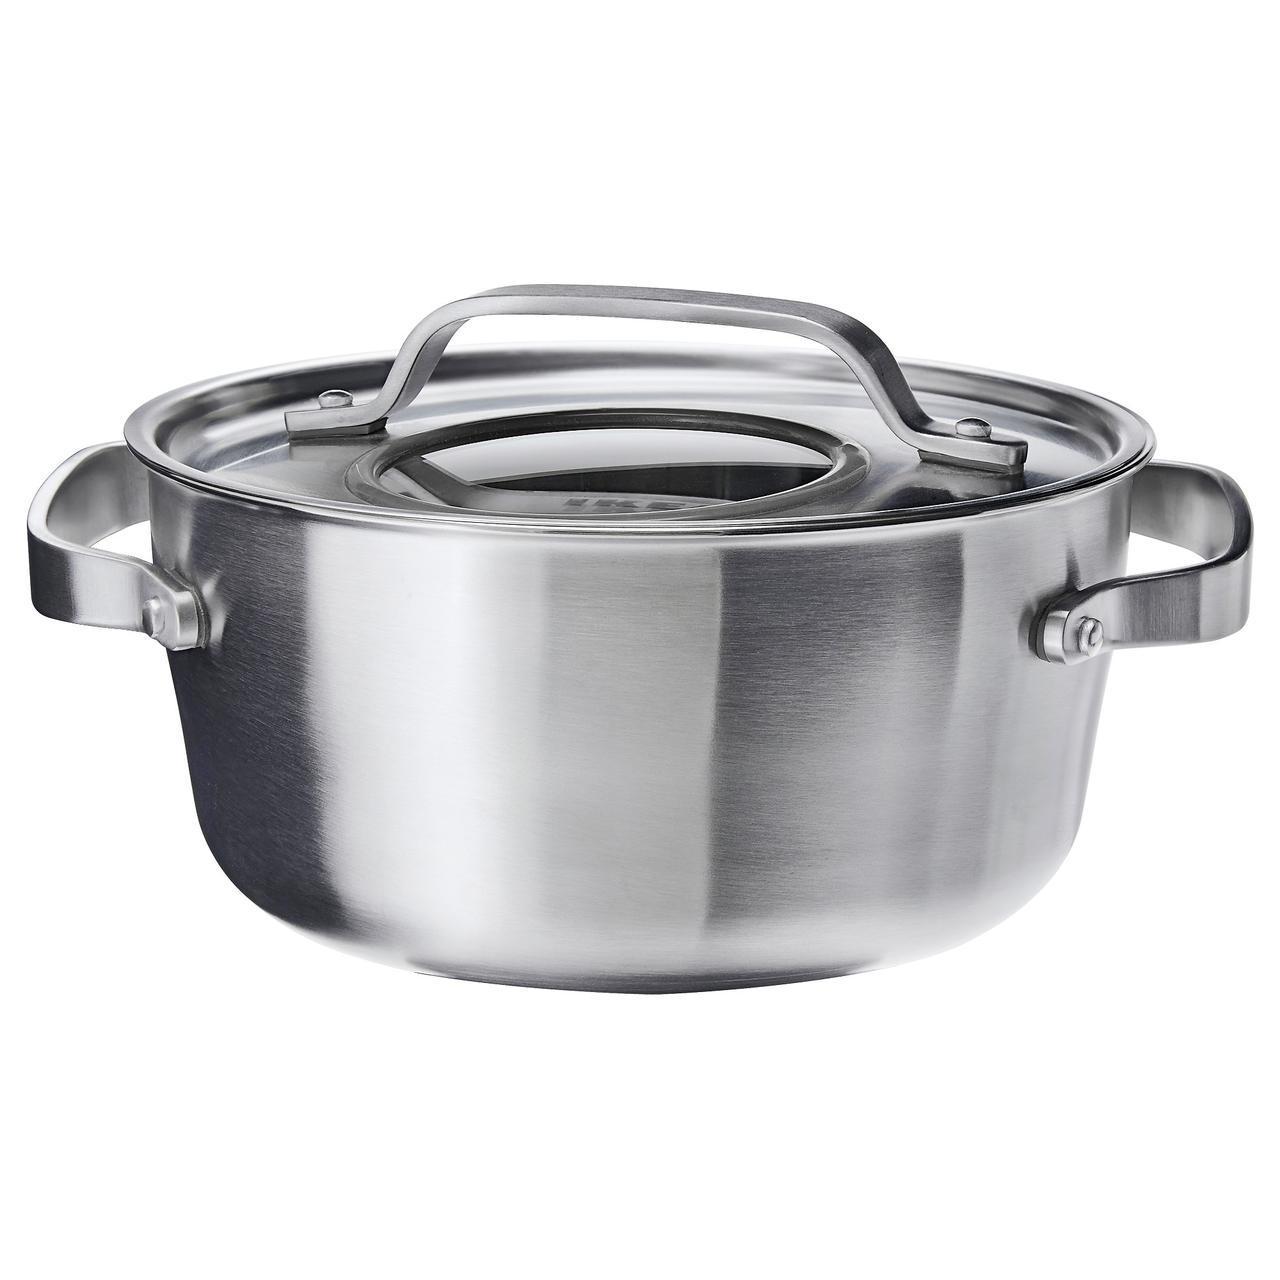 ✅ IKEA SENSUELL (103.245.46) Кастрюля с крышкой нержавеющая сталь, серый